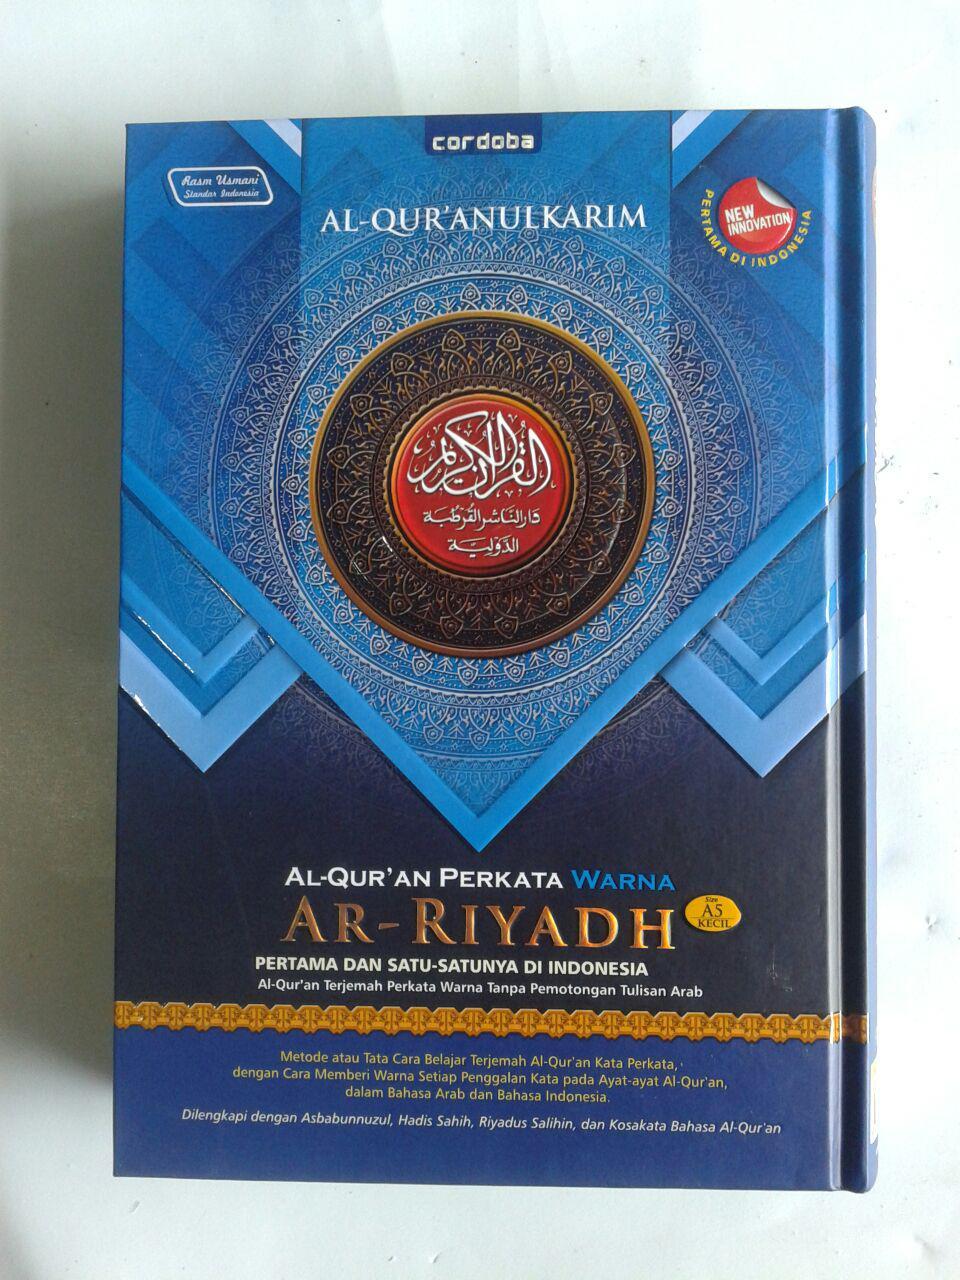 Al-Qur'an Terjemah Perkata Warna Ar-Riyadh Ukuran A5 cover